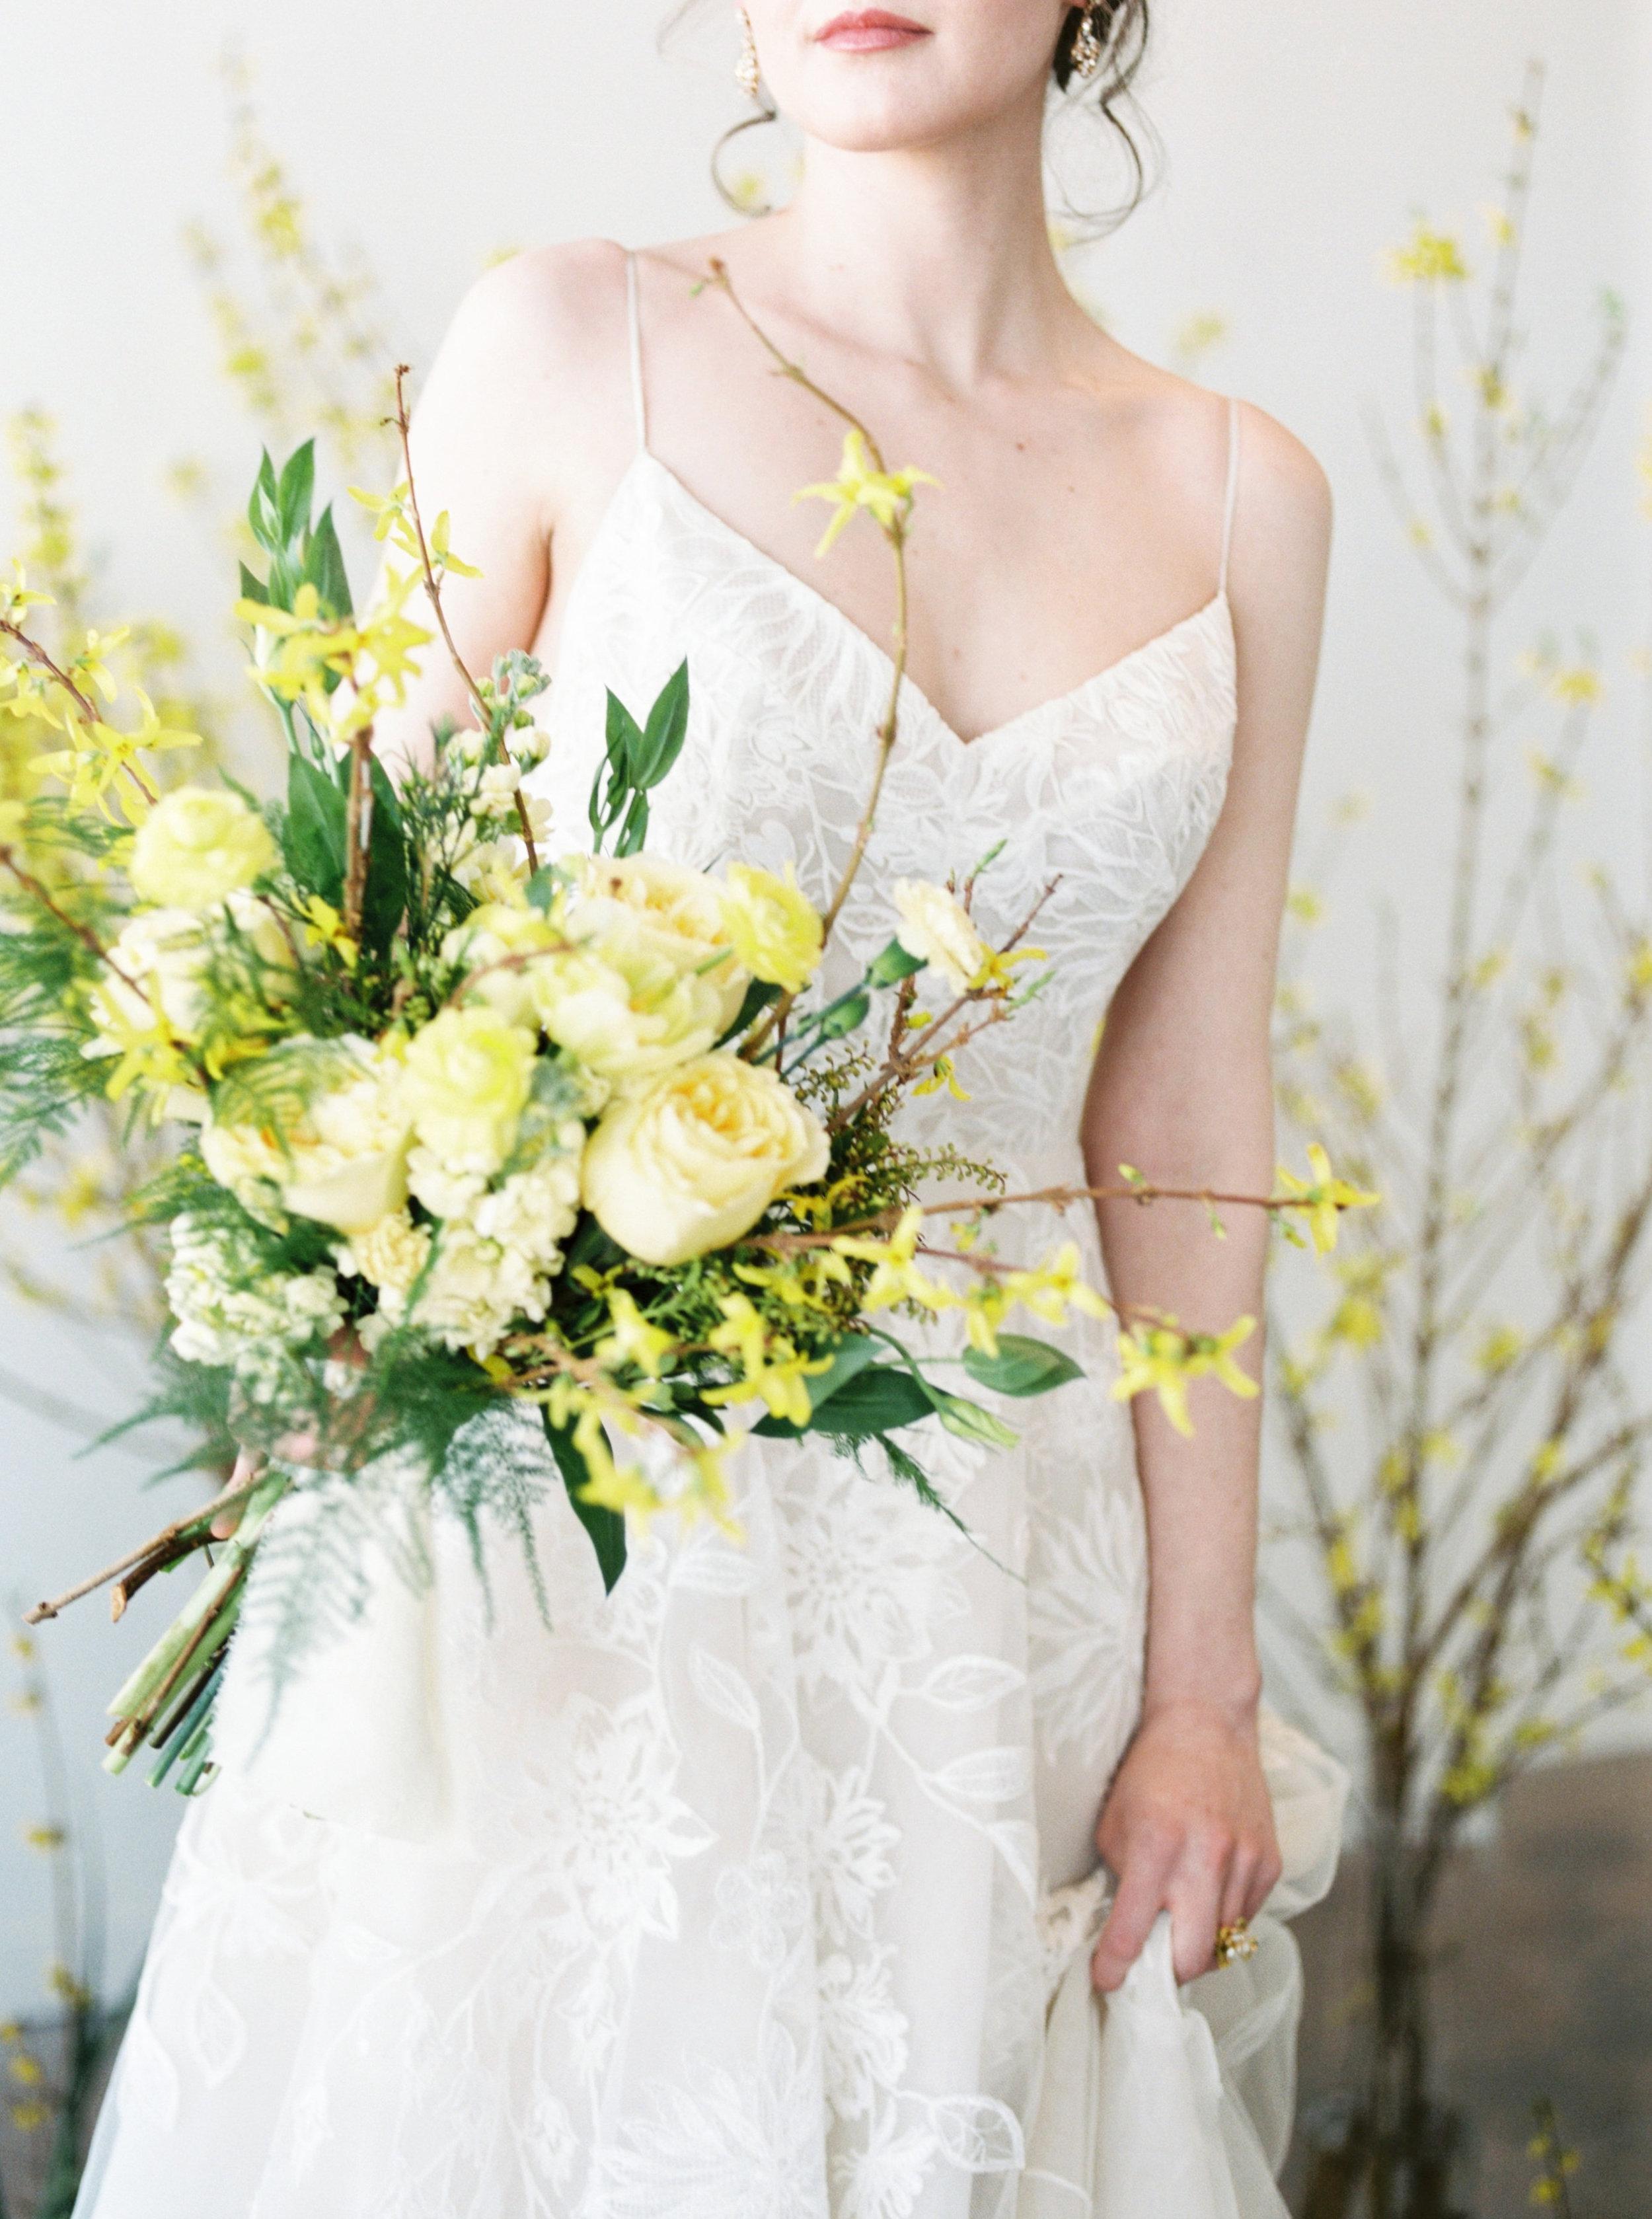 "Lela Rose ""The Altar"" wedding dress | Spring Bridal Inspiration from Little White Dress Bridal Shop in Denver, Colorado | Decorus Photography"